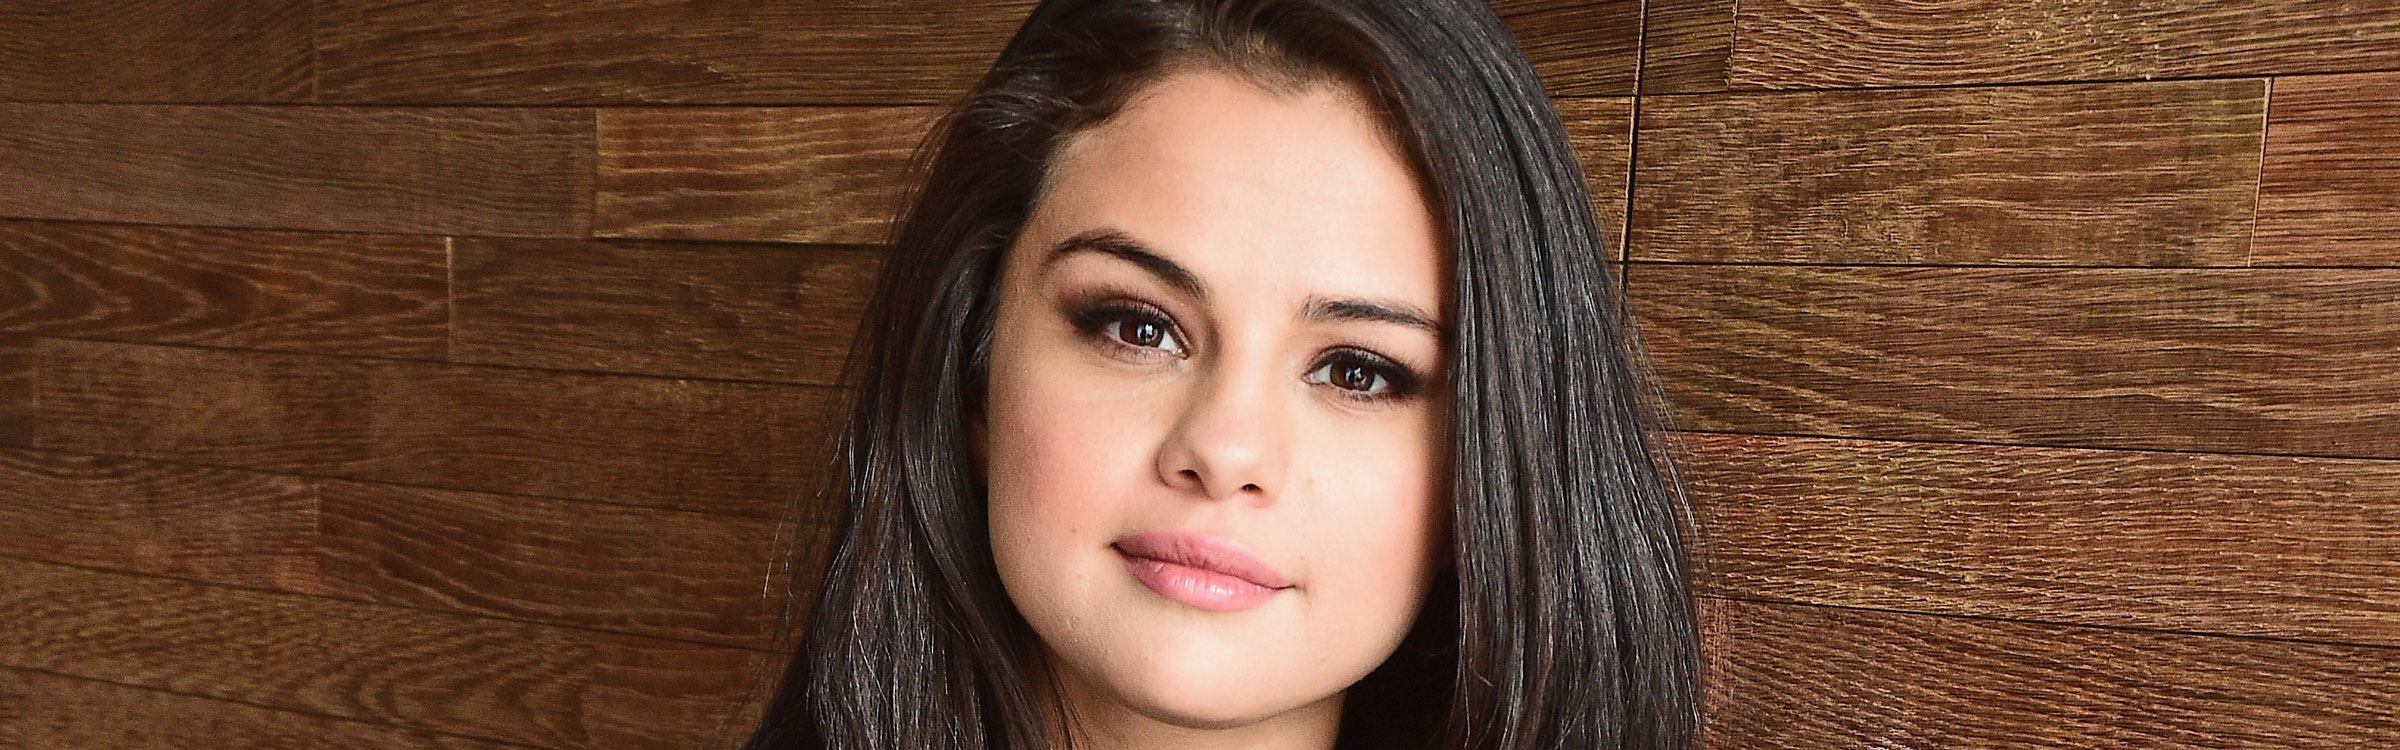 Selena header